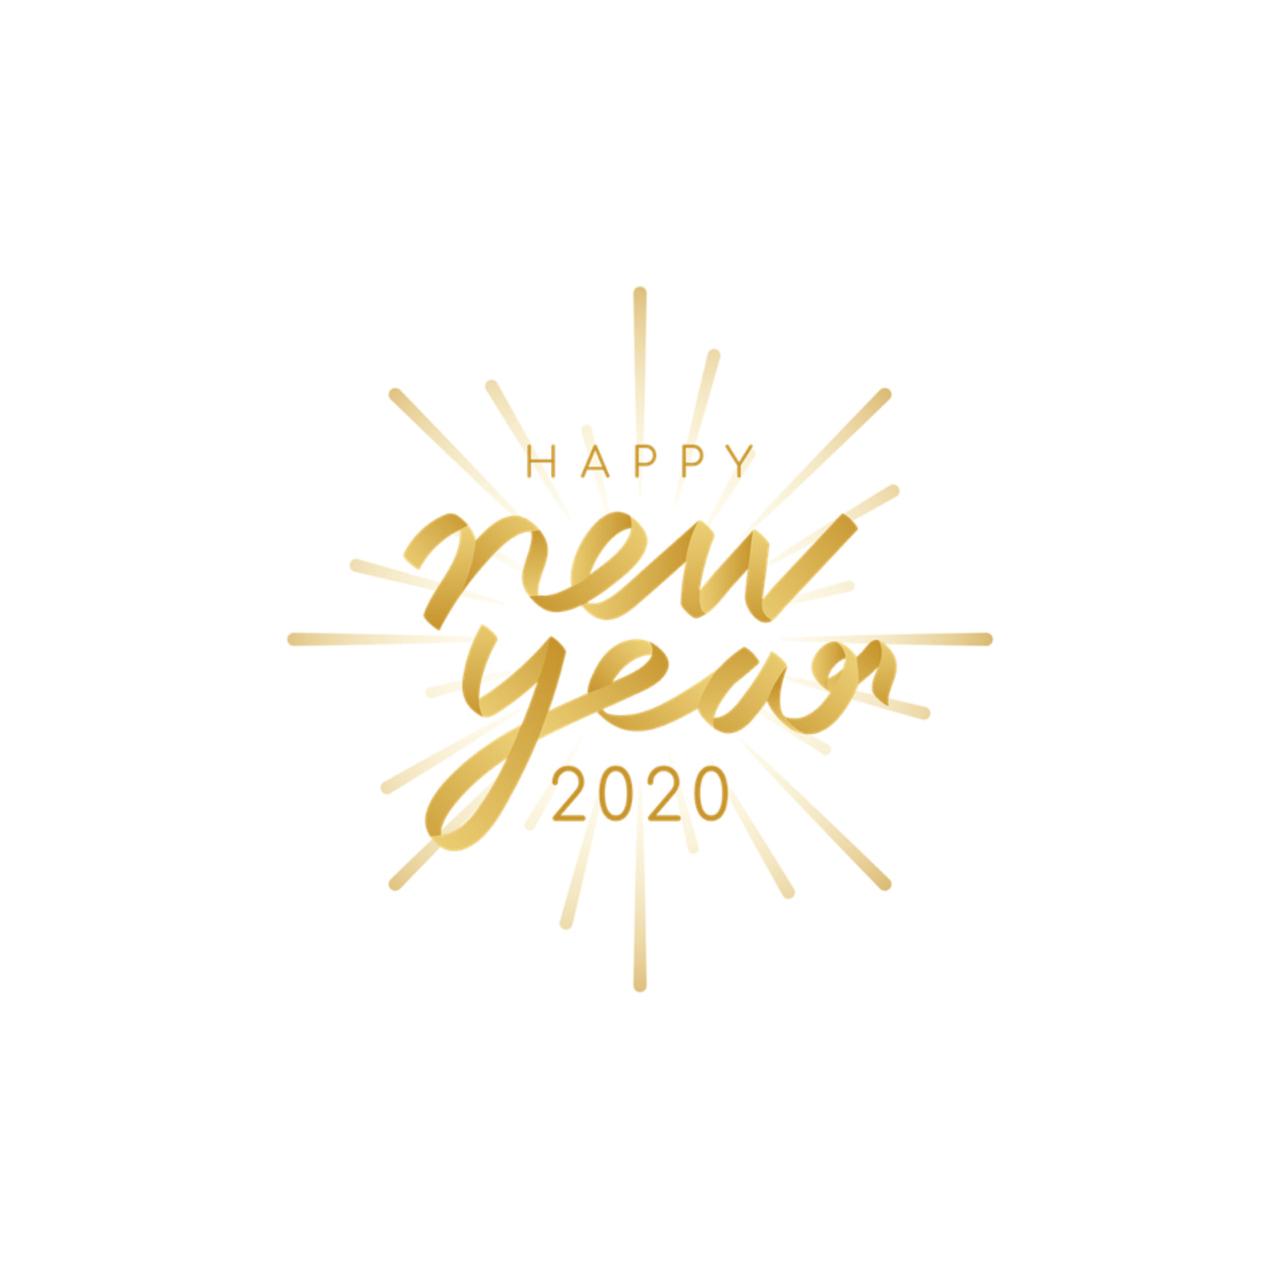 2020, articles, and Croatia image